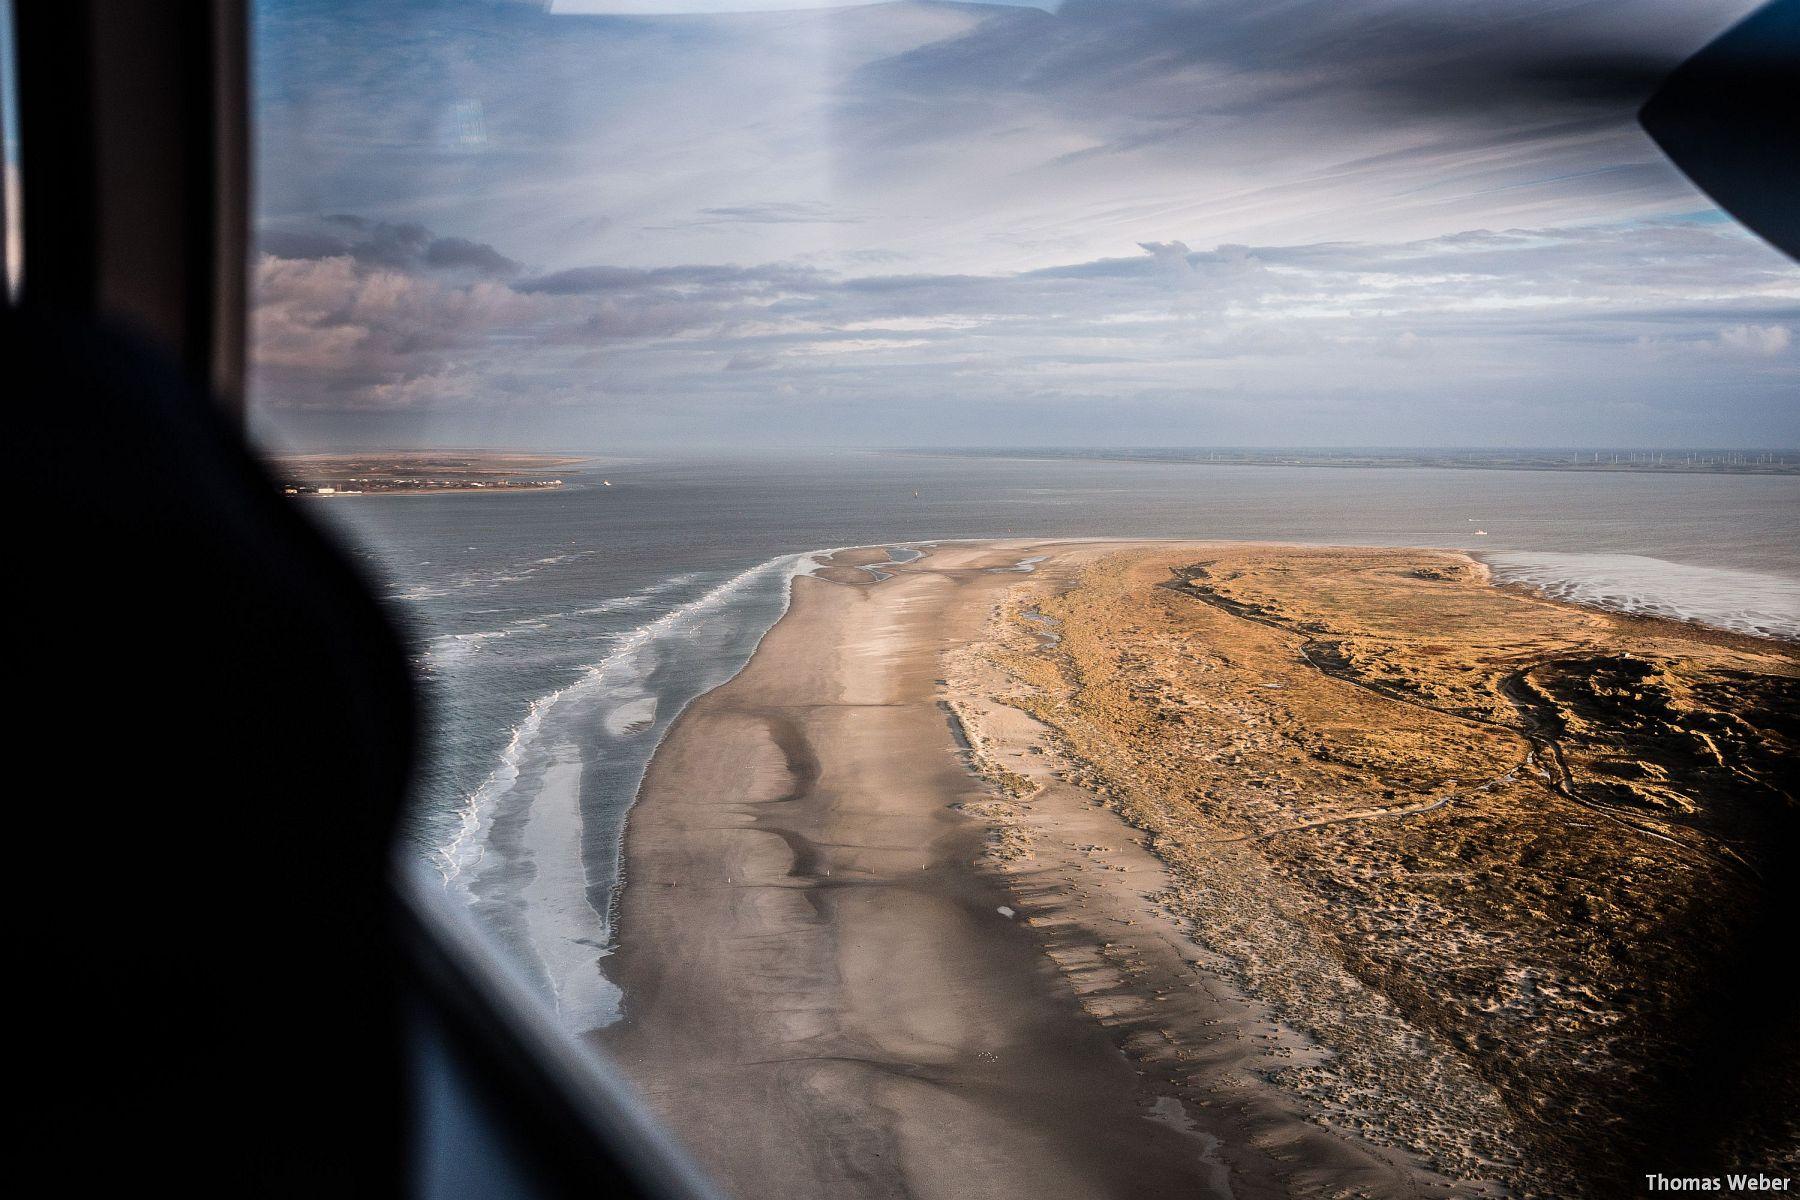 Fotograf Thomas Weber aus Oldenburg: Flucht vor dem Orkan Xaver mit dem Inselflieger Juist (7)